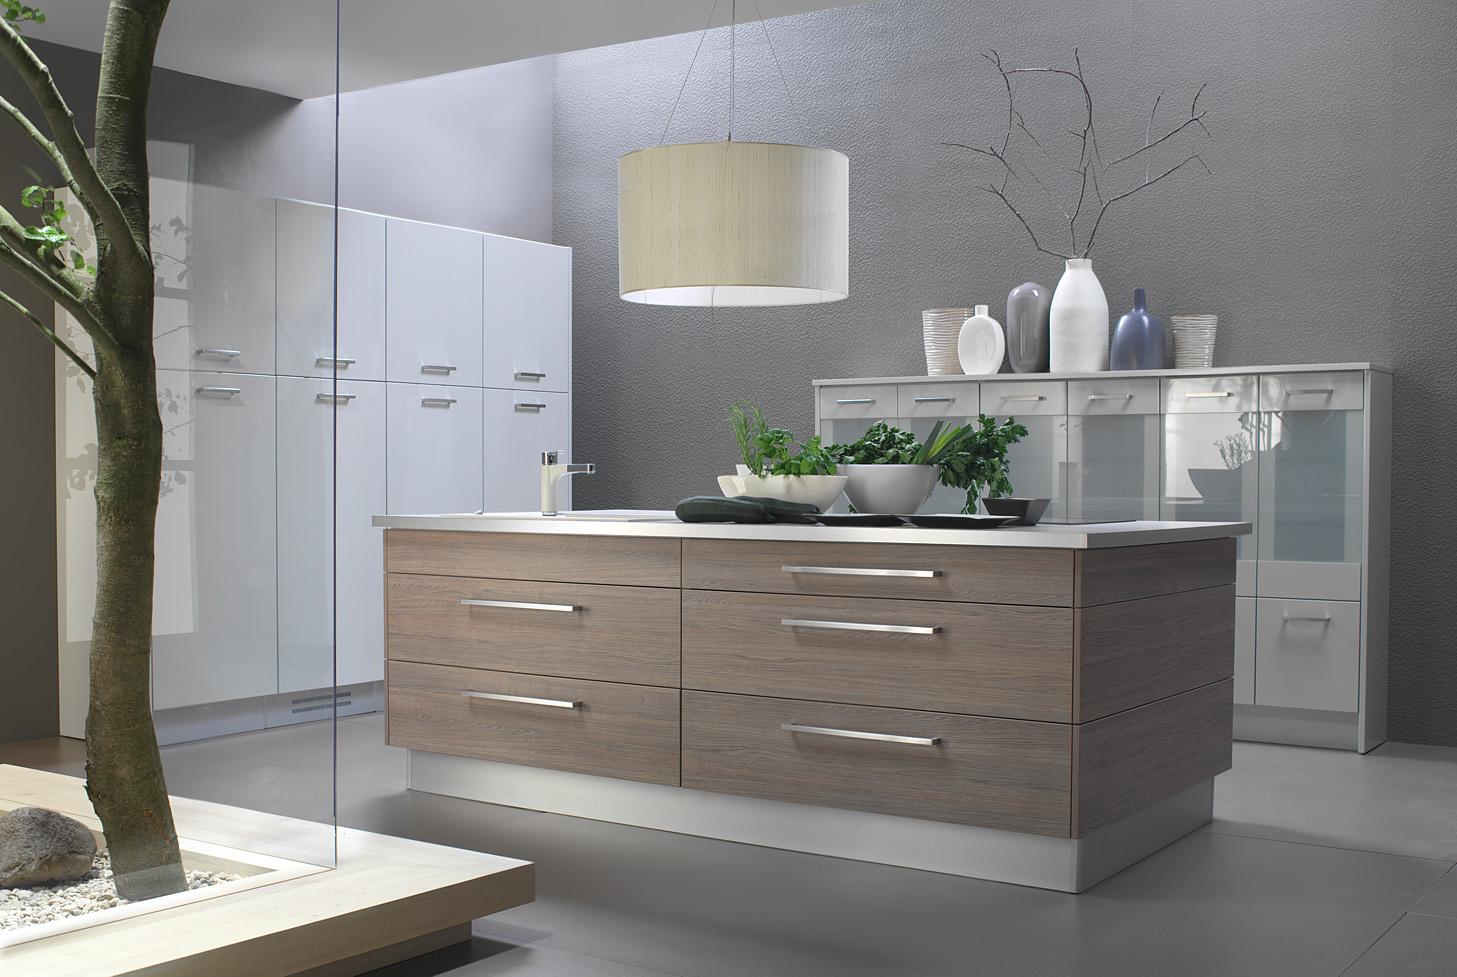 cupboard laminate designs photo - 1